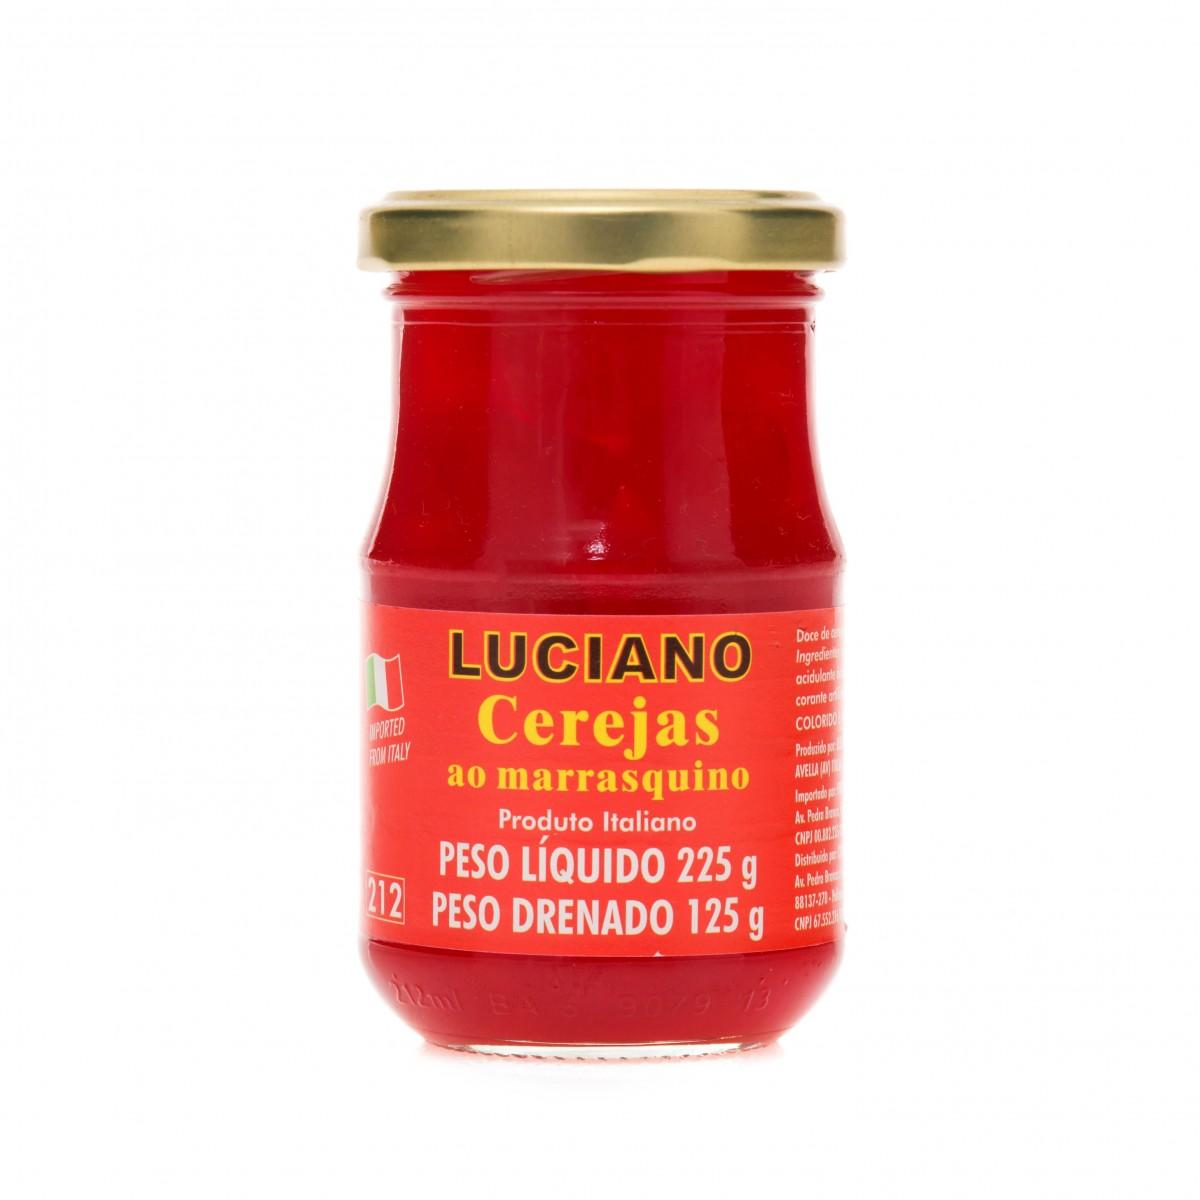 Cereja ao Marrasquino Luciano